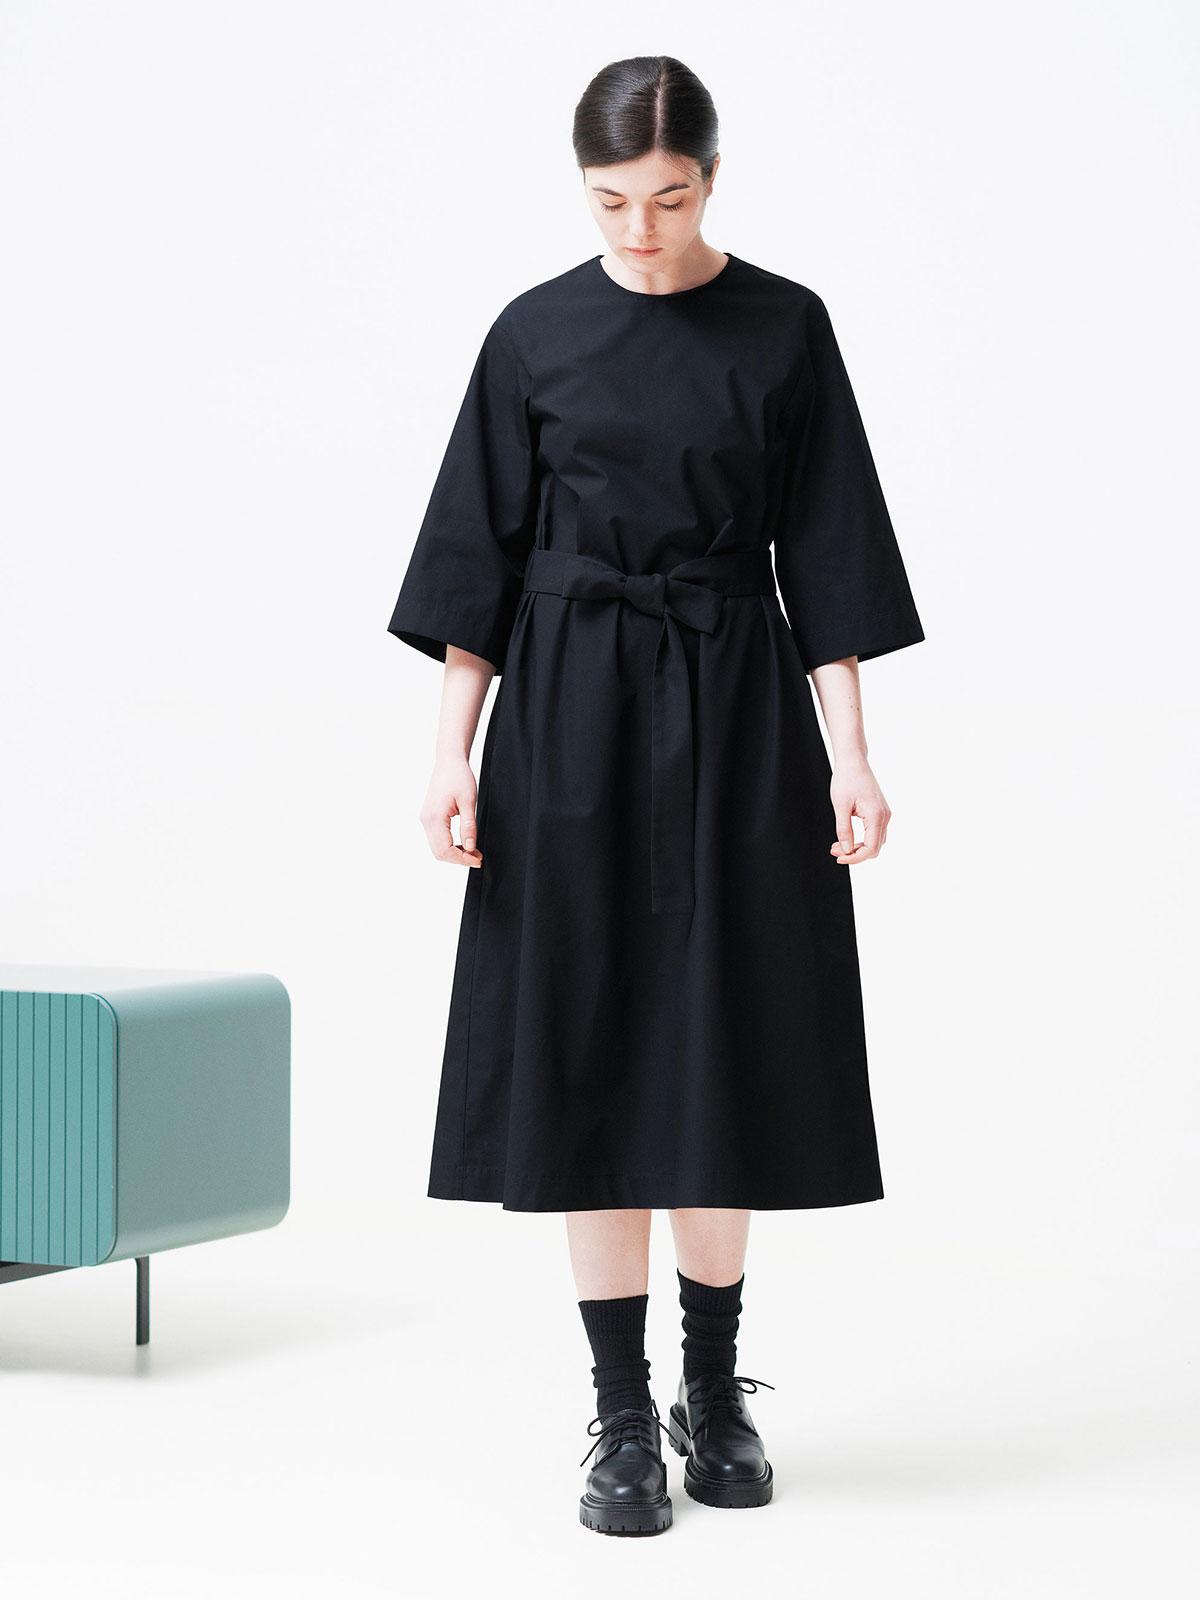 ELISAVETA DRESS mid-length belted dress made from high-quality cotton poplin